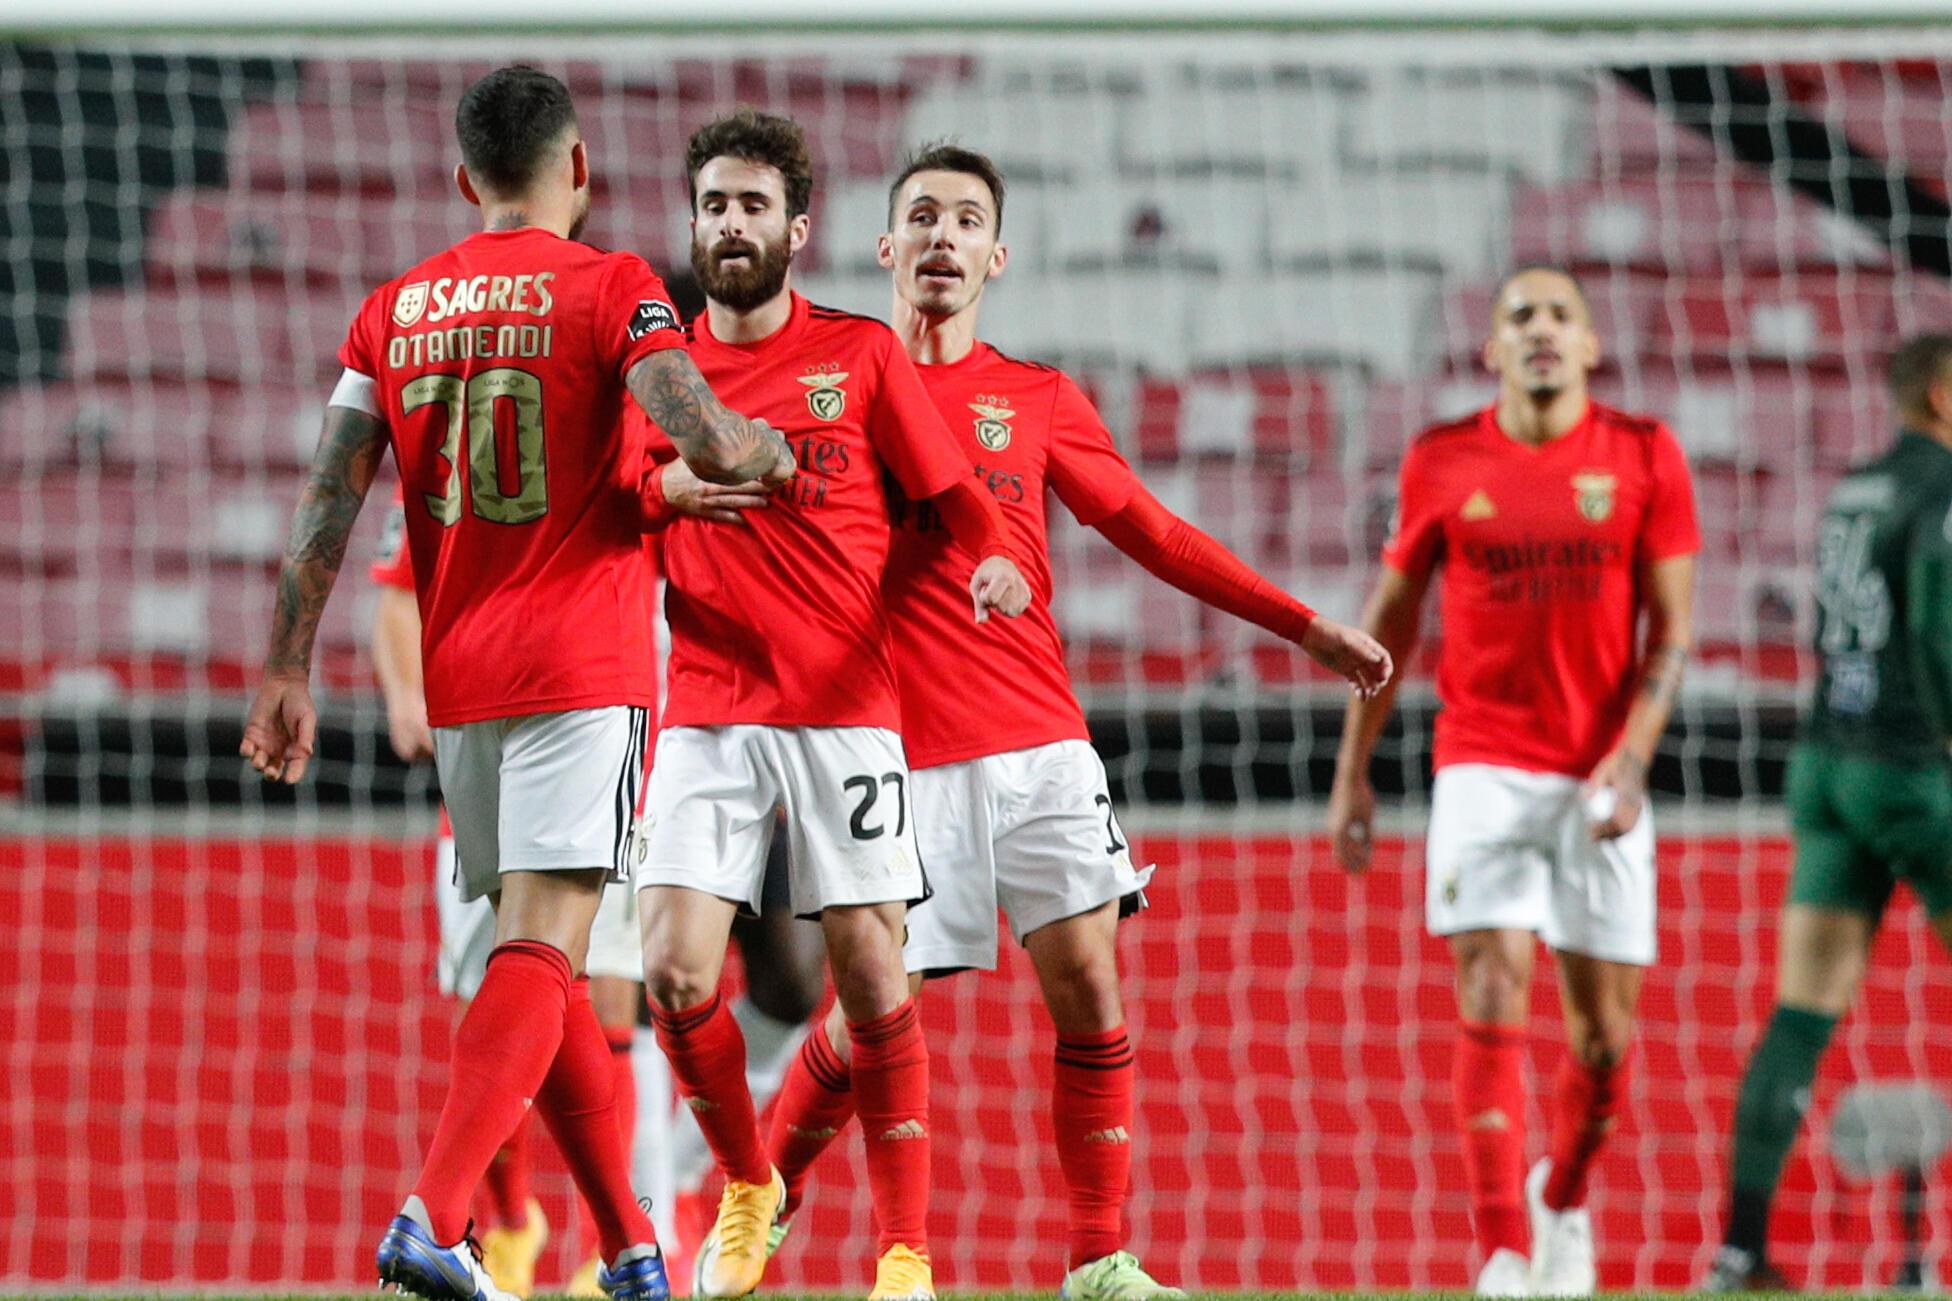 Rafa Silva - SL Benfica - Desporto - Futebol - Liga Portuguesa - Football - Portugal